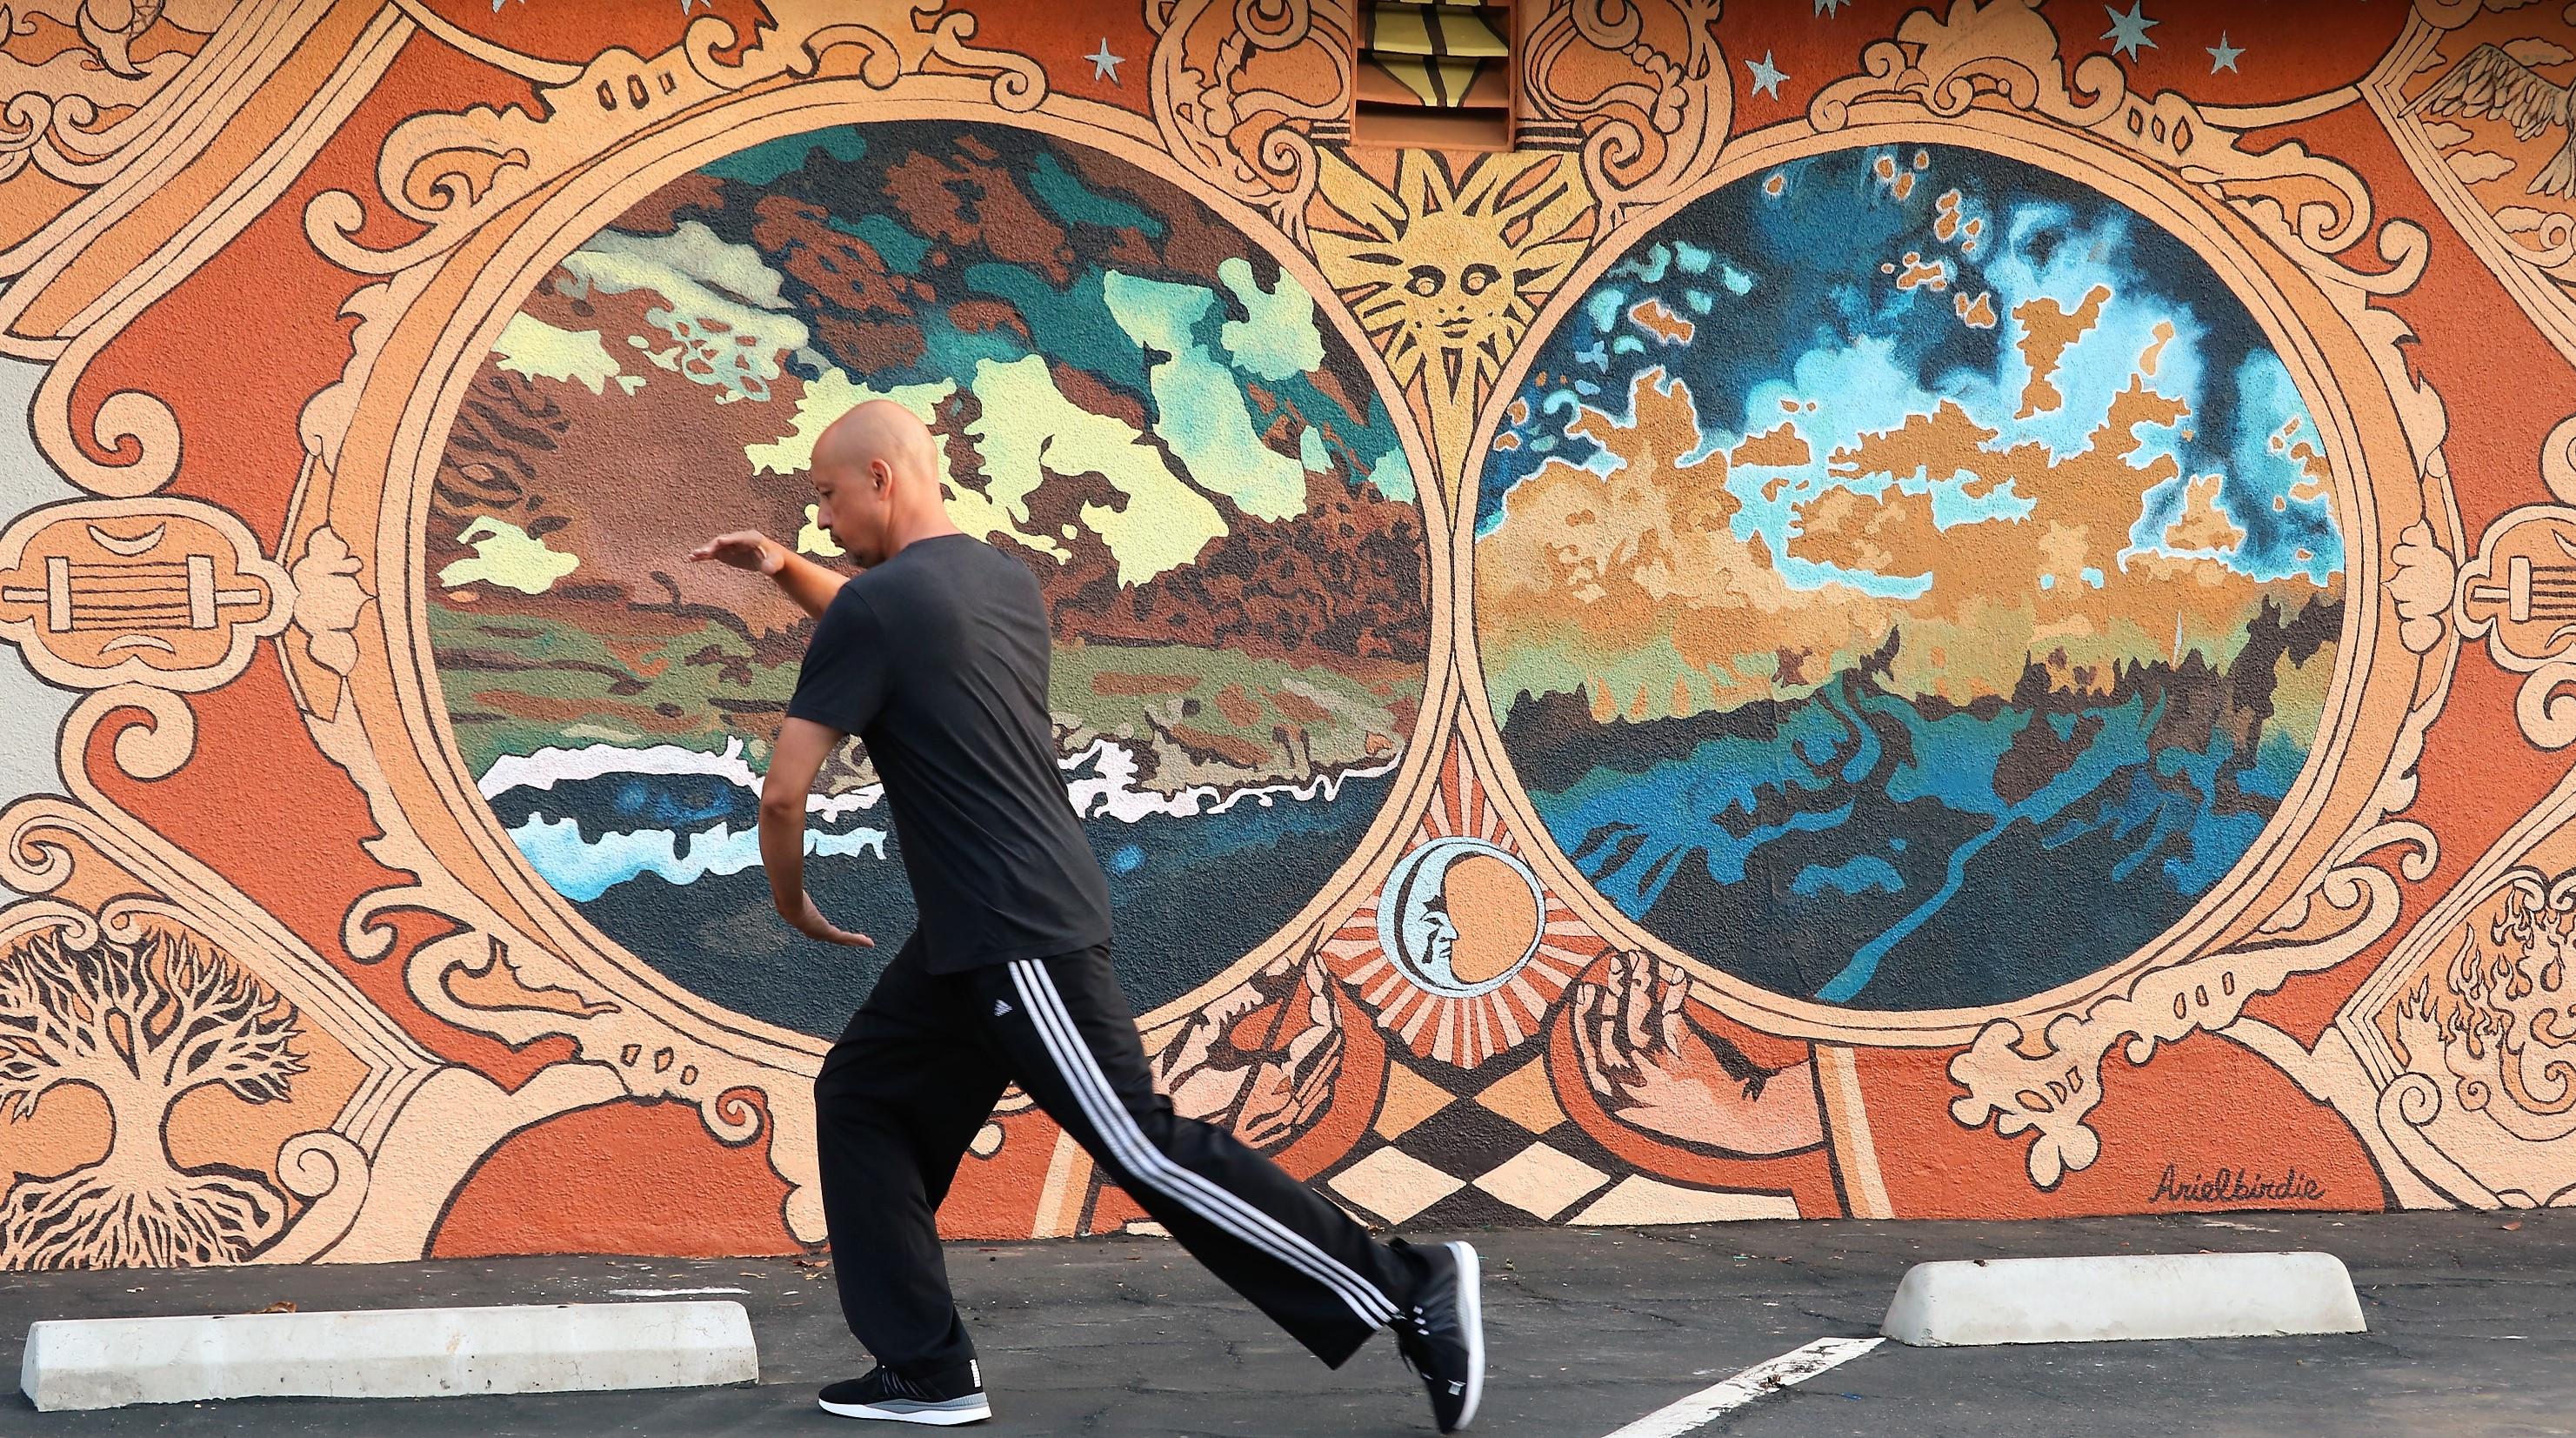 Thursday Tai Chi by Mural 6:30-7:15 AM